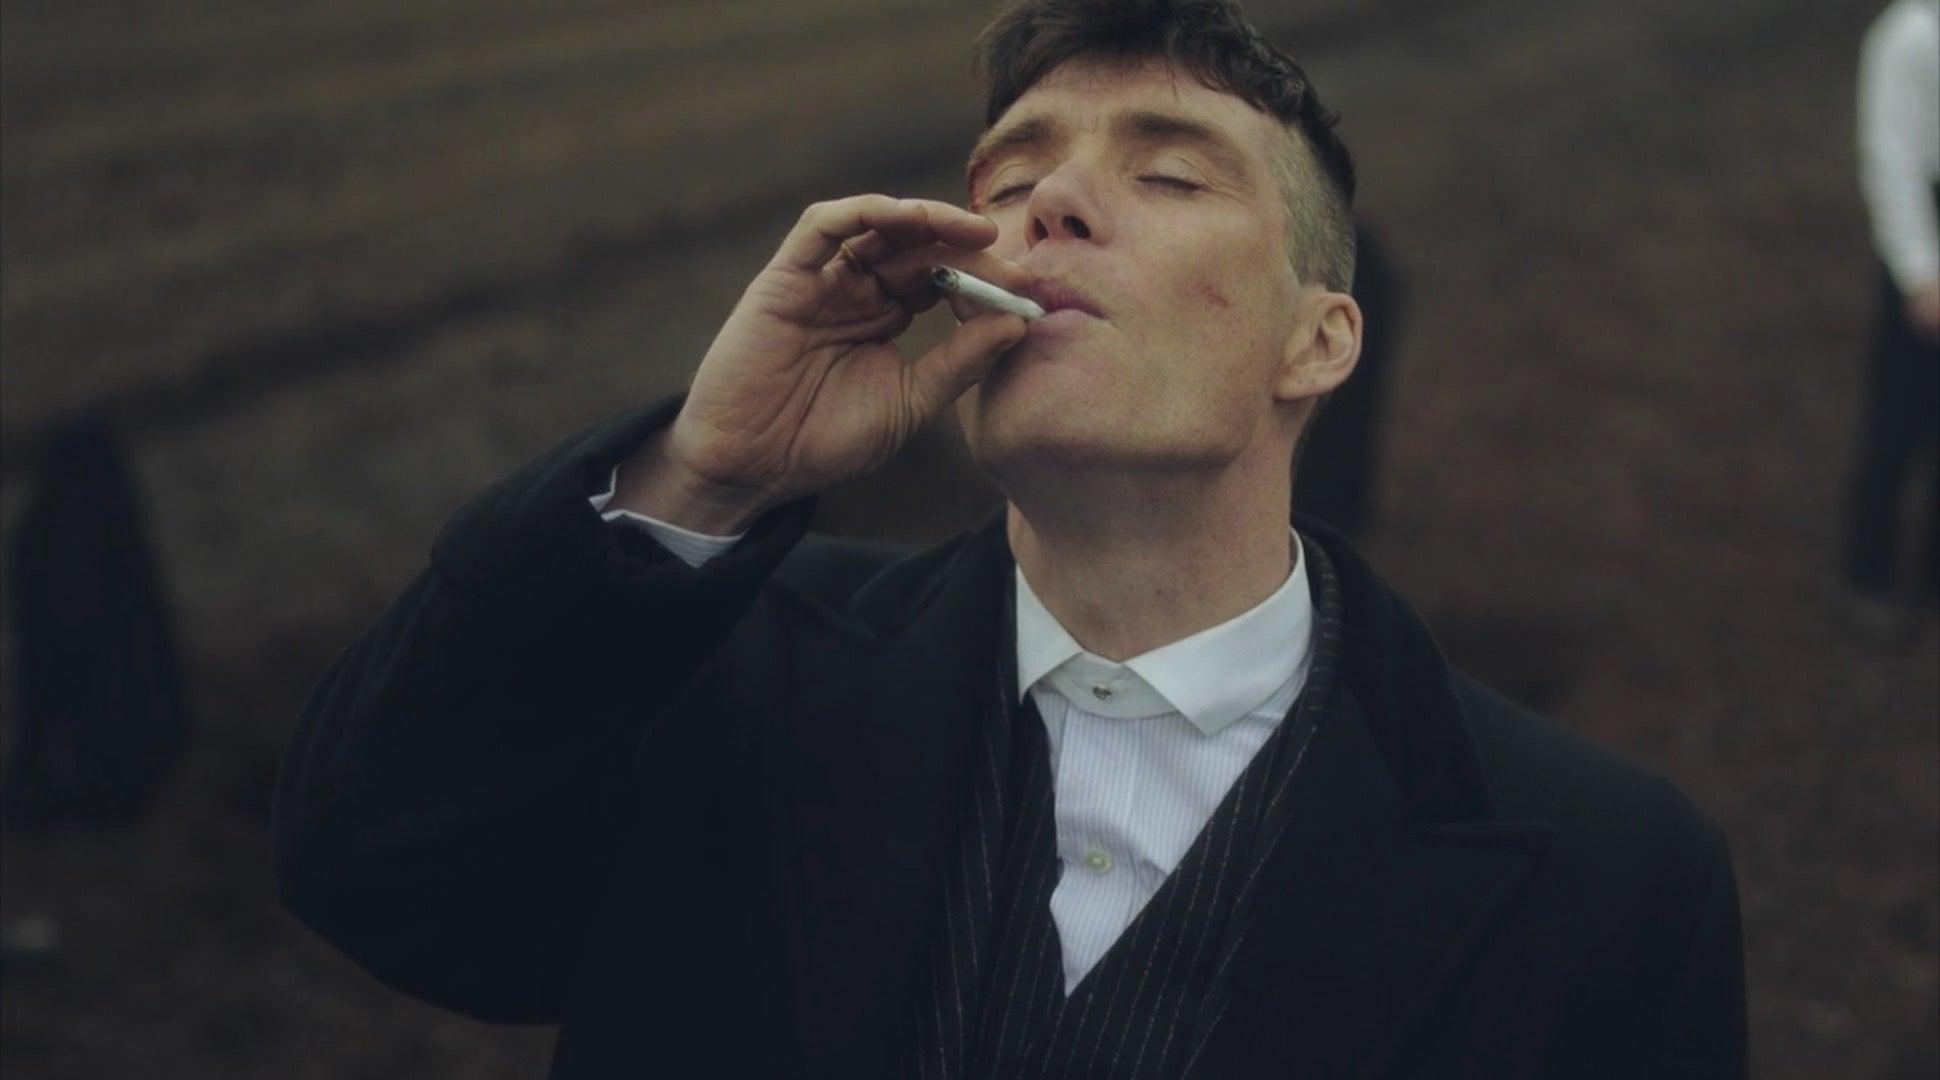 Peaky Blinders Cillian Murphy Has Smoked Over 3 000